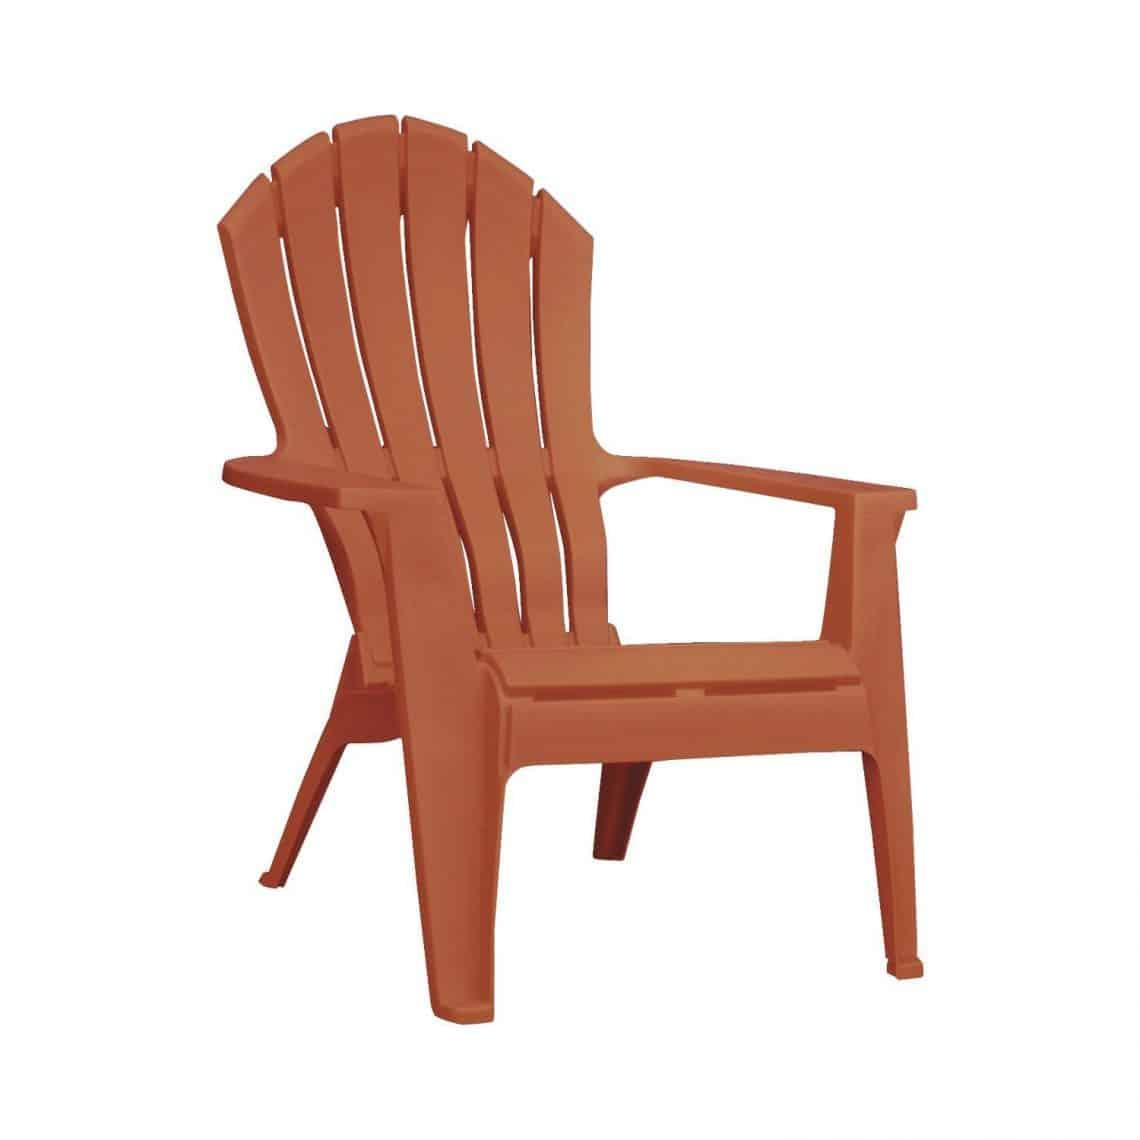 Adams Realcomfort Adirondack Resin Chair 10 Colors To